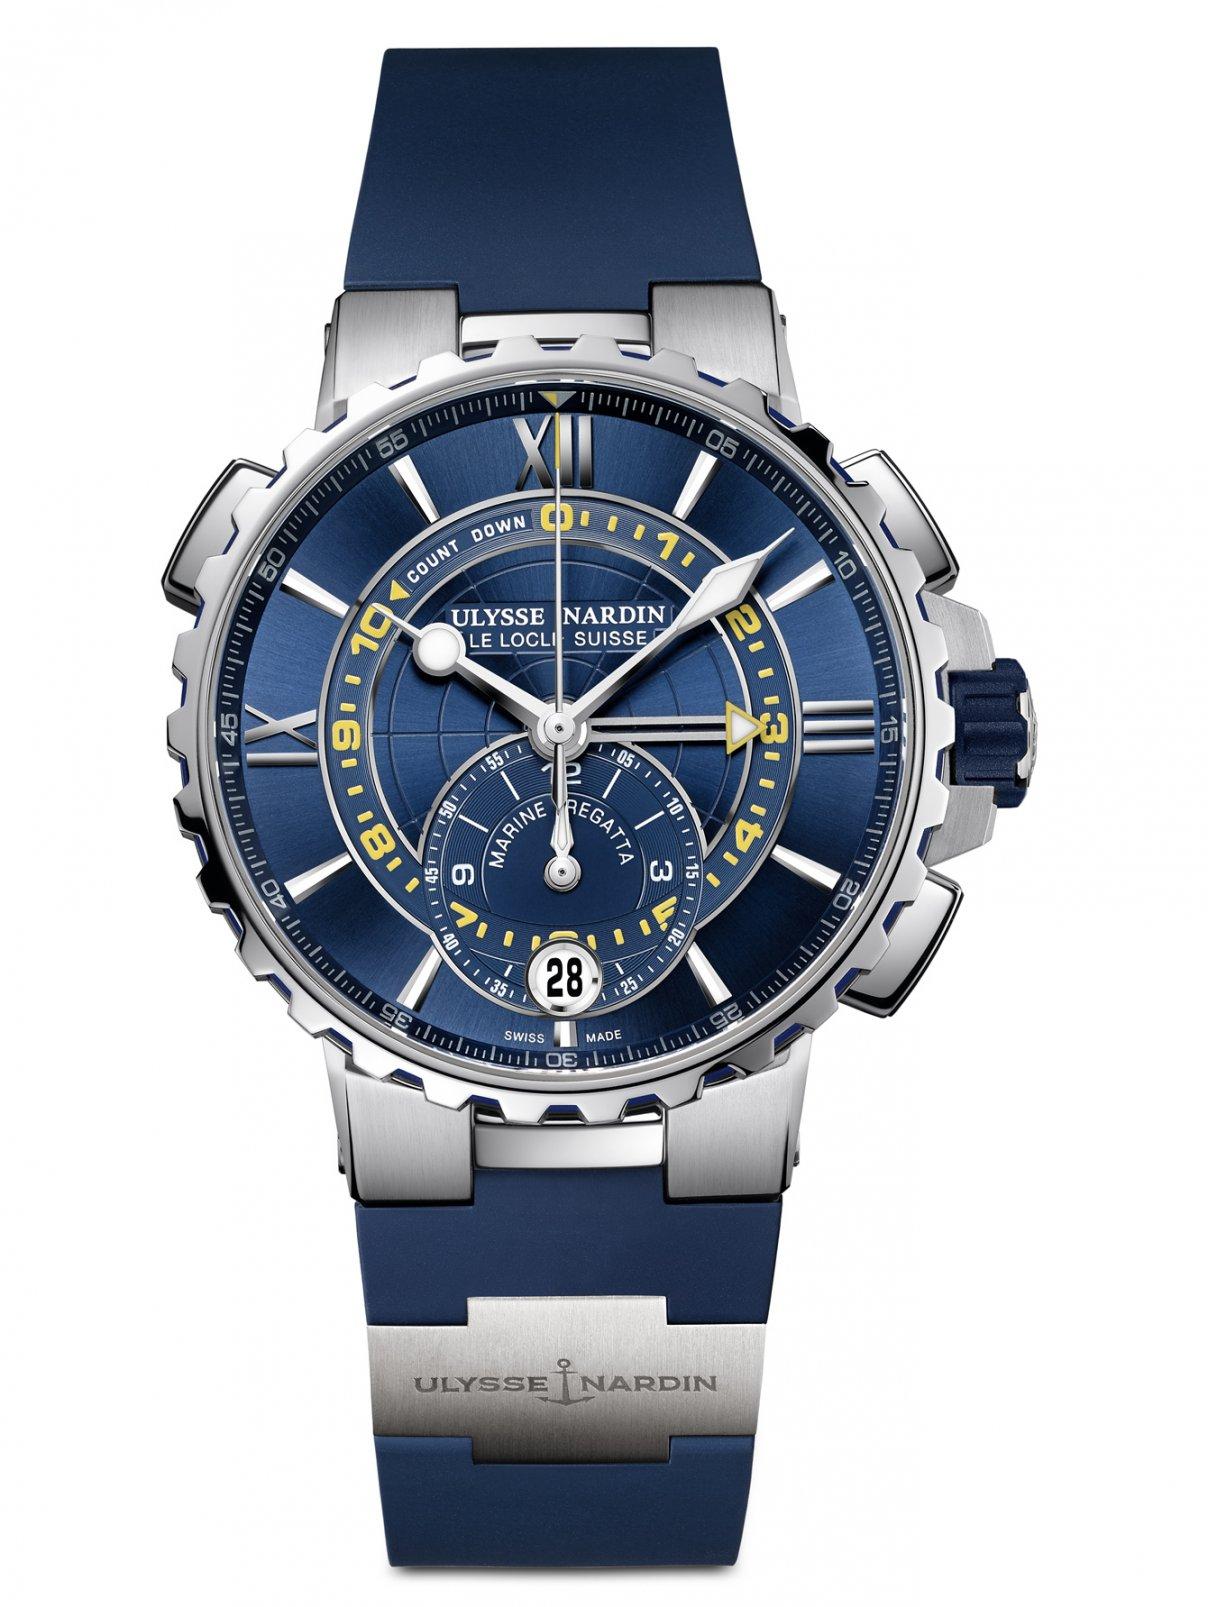 Часы 1553-155-3/43 Marine Regatta Ulysse Nardin  –  Общий вид